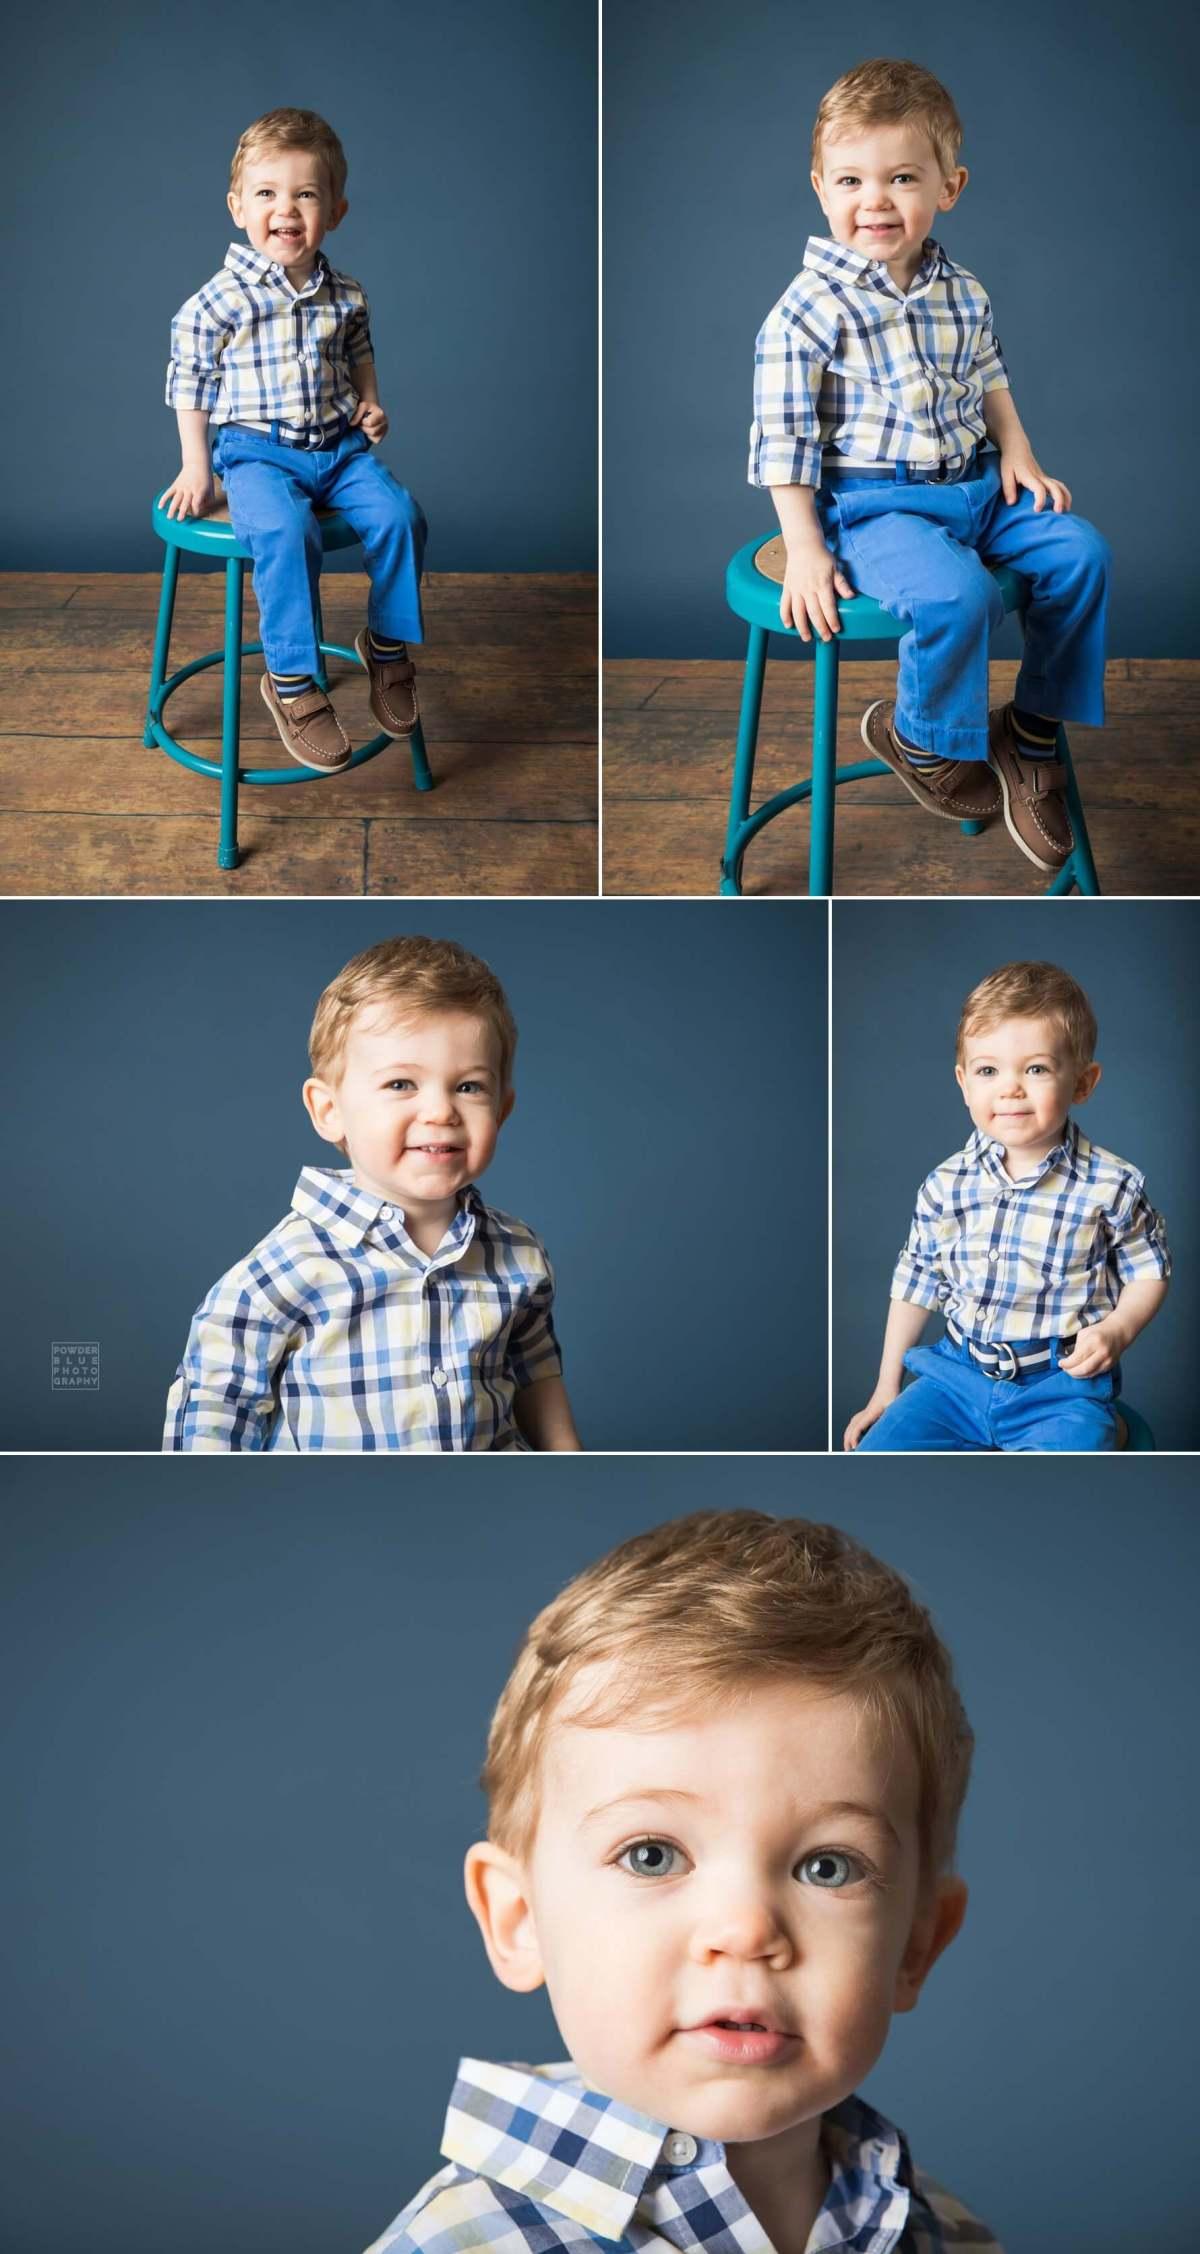 pittsburgh photography studio. aquamarine blue seamless paper by savage.